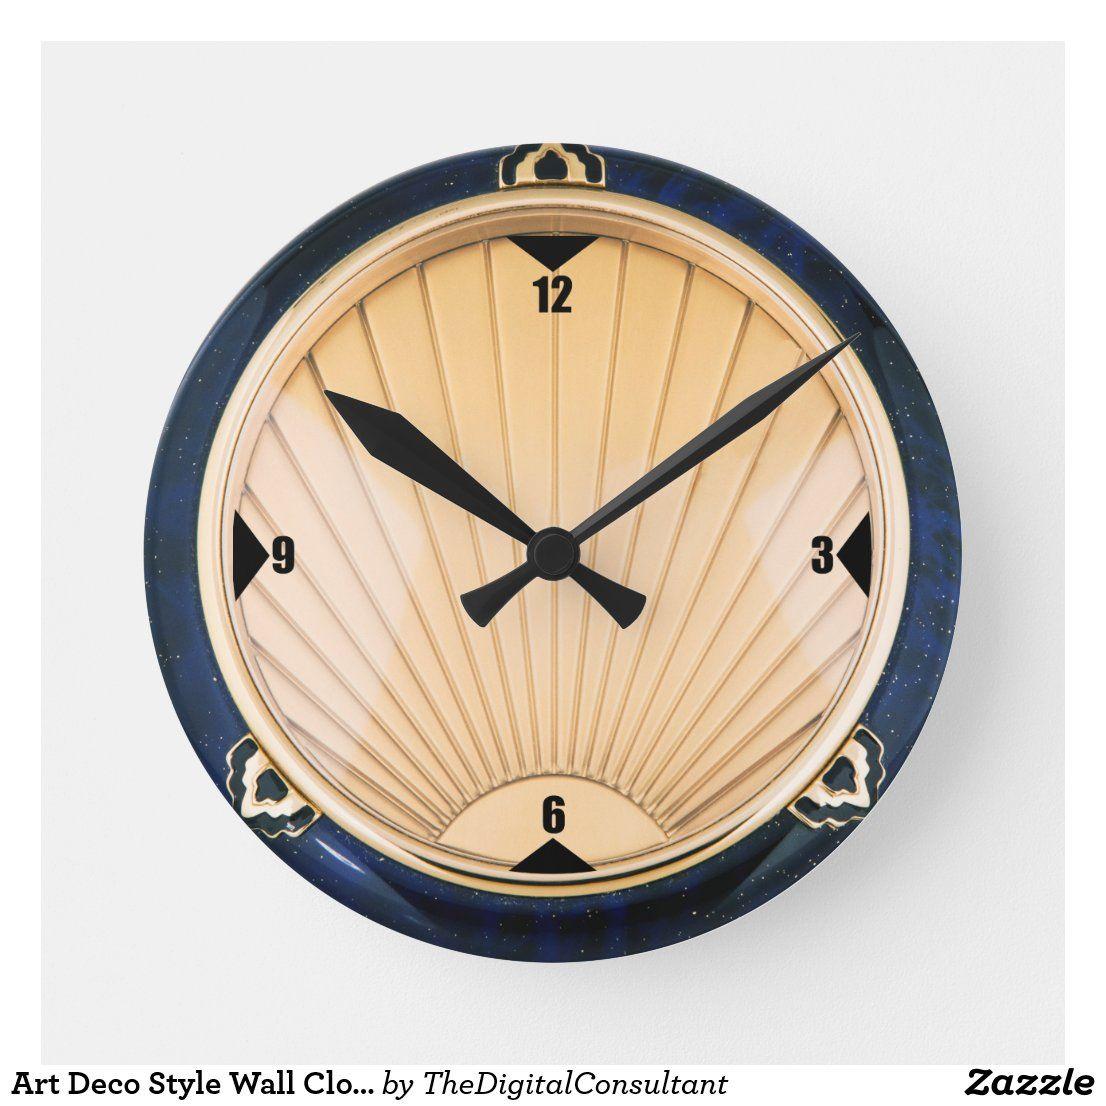 Art Deco Style Wall Clock Zazzle Com Art Deco Clock Art Deco Interior Clock Art